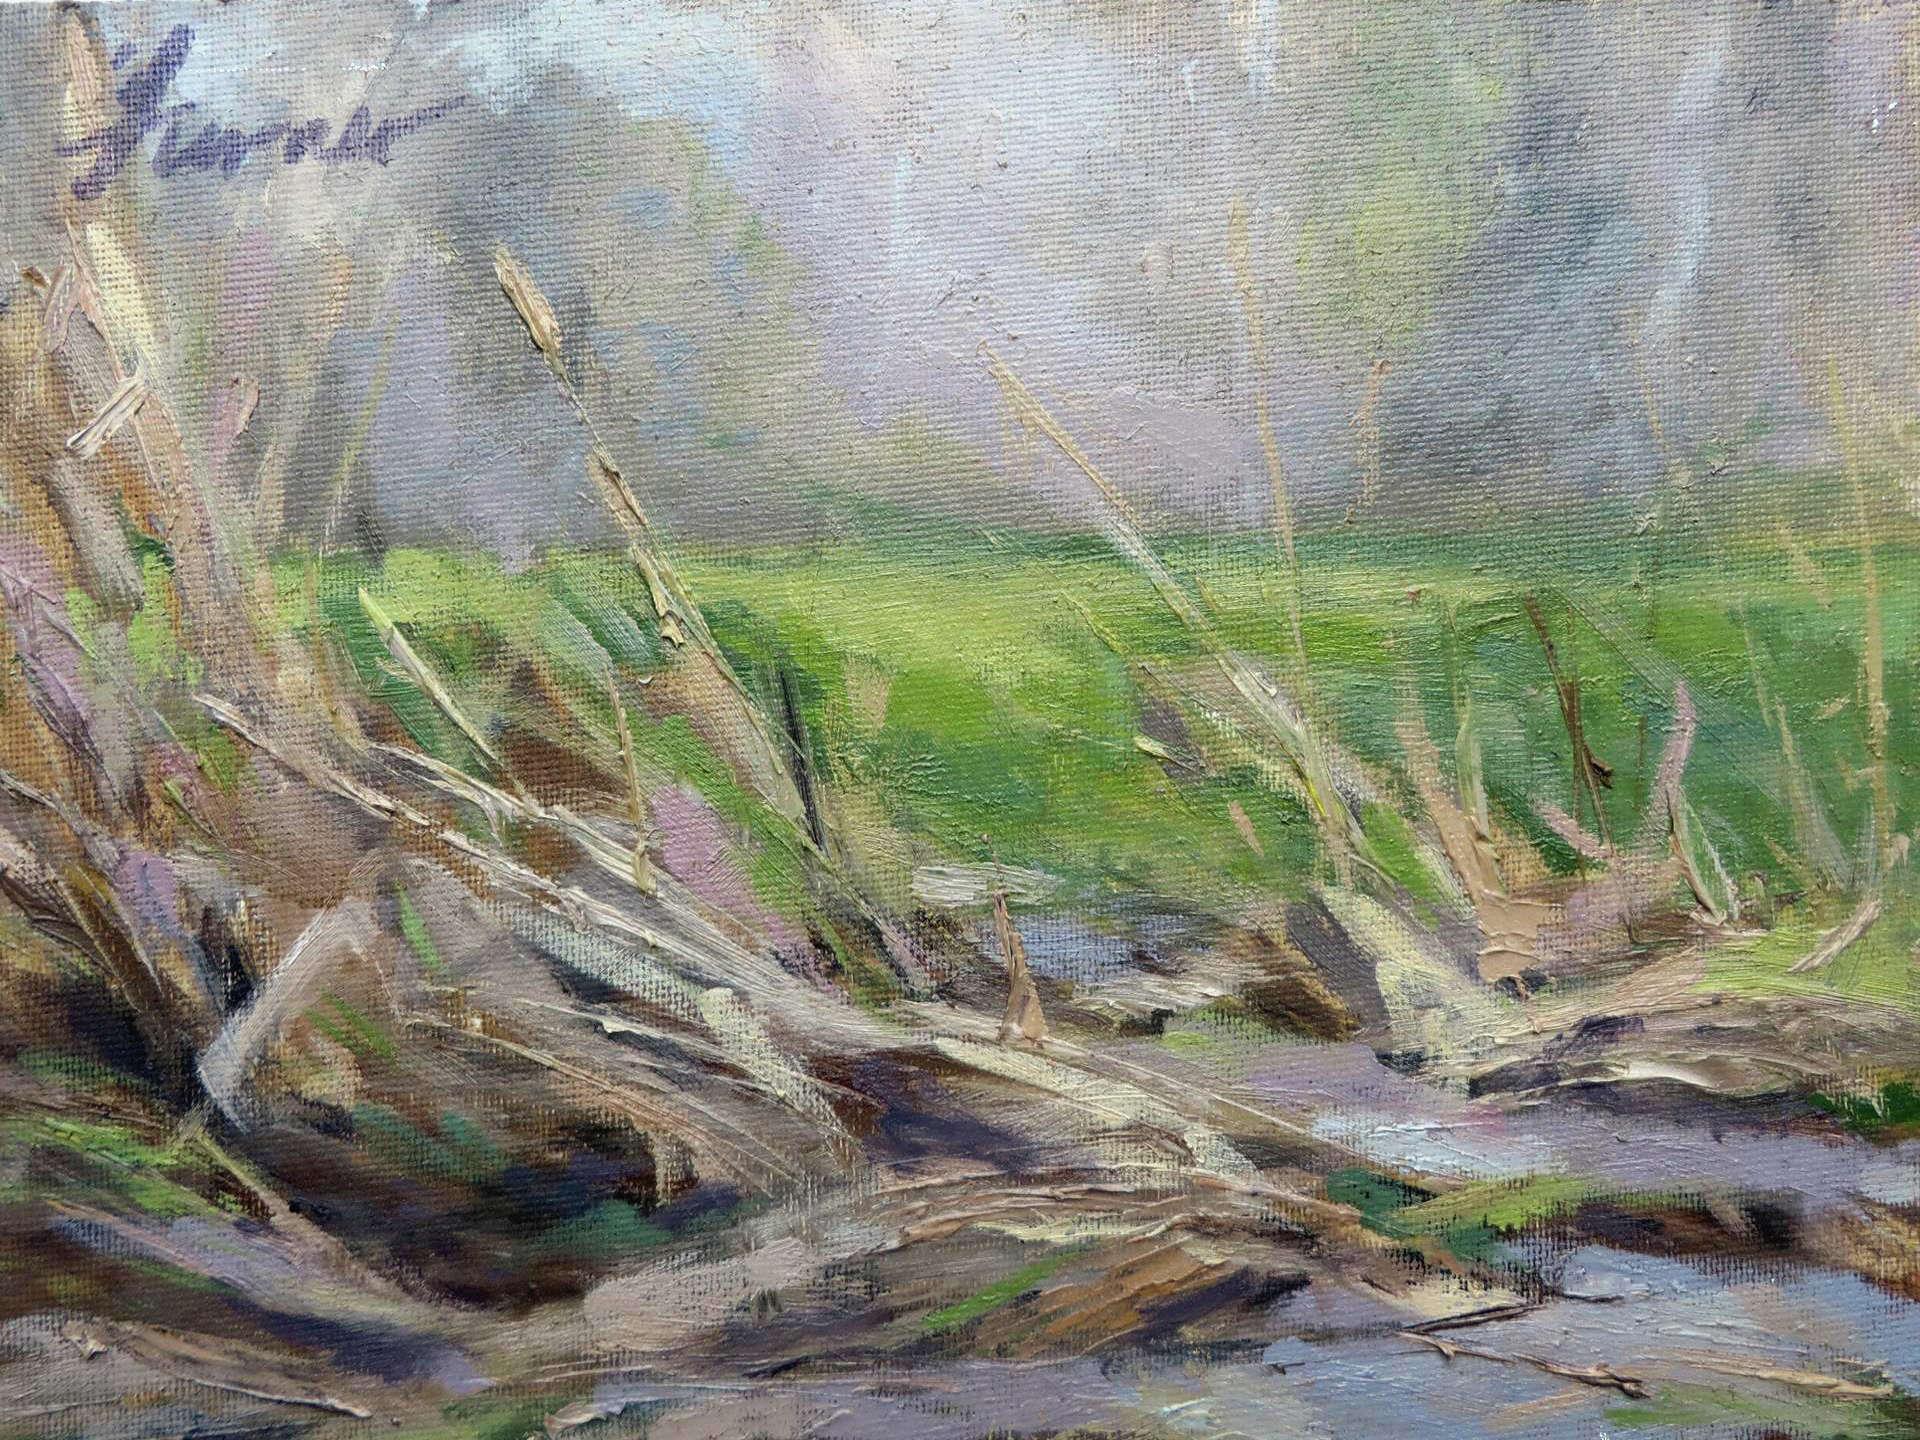 Bridgette Turner | SPRING THAW – WHETSTONE PARK PRAIRIE | oil | frame size 12x14